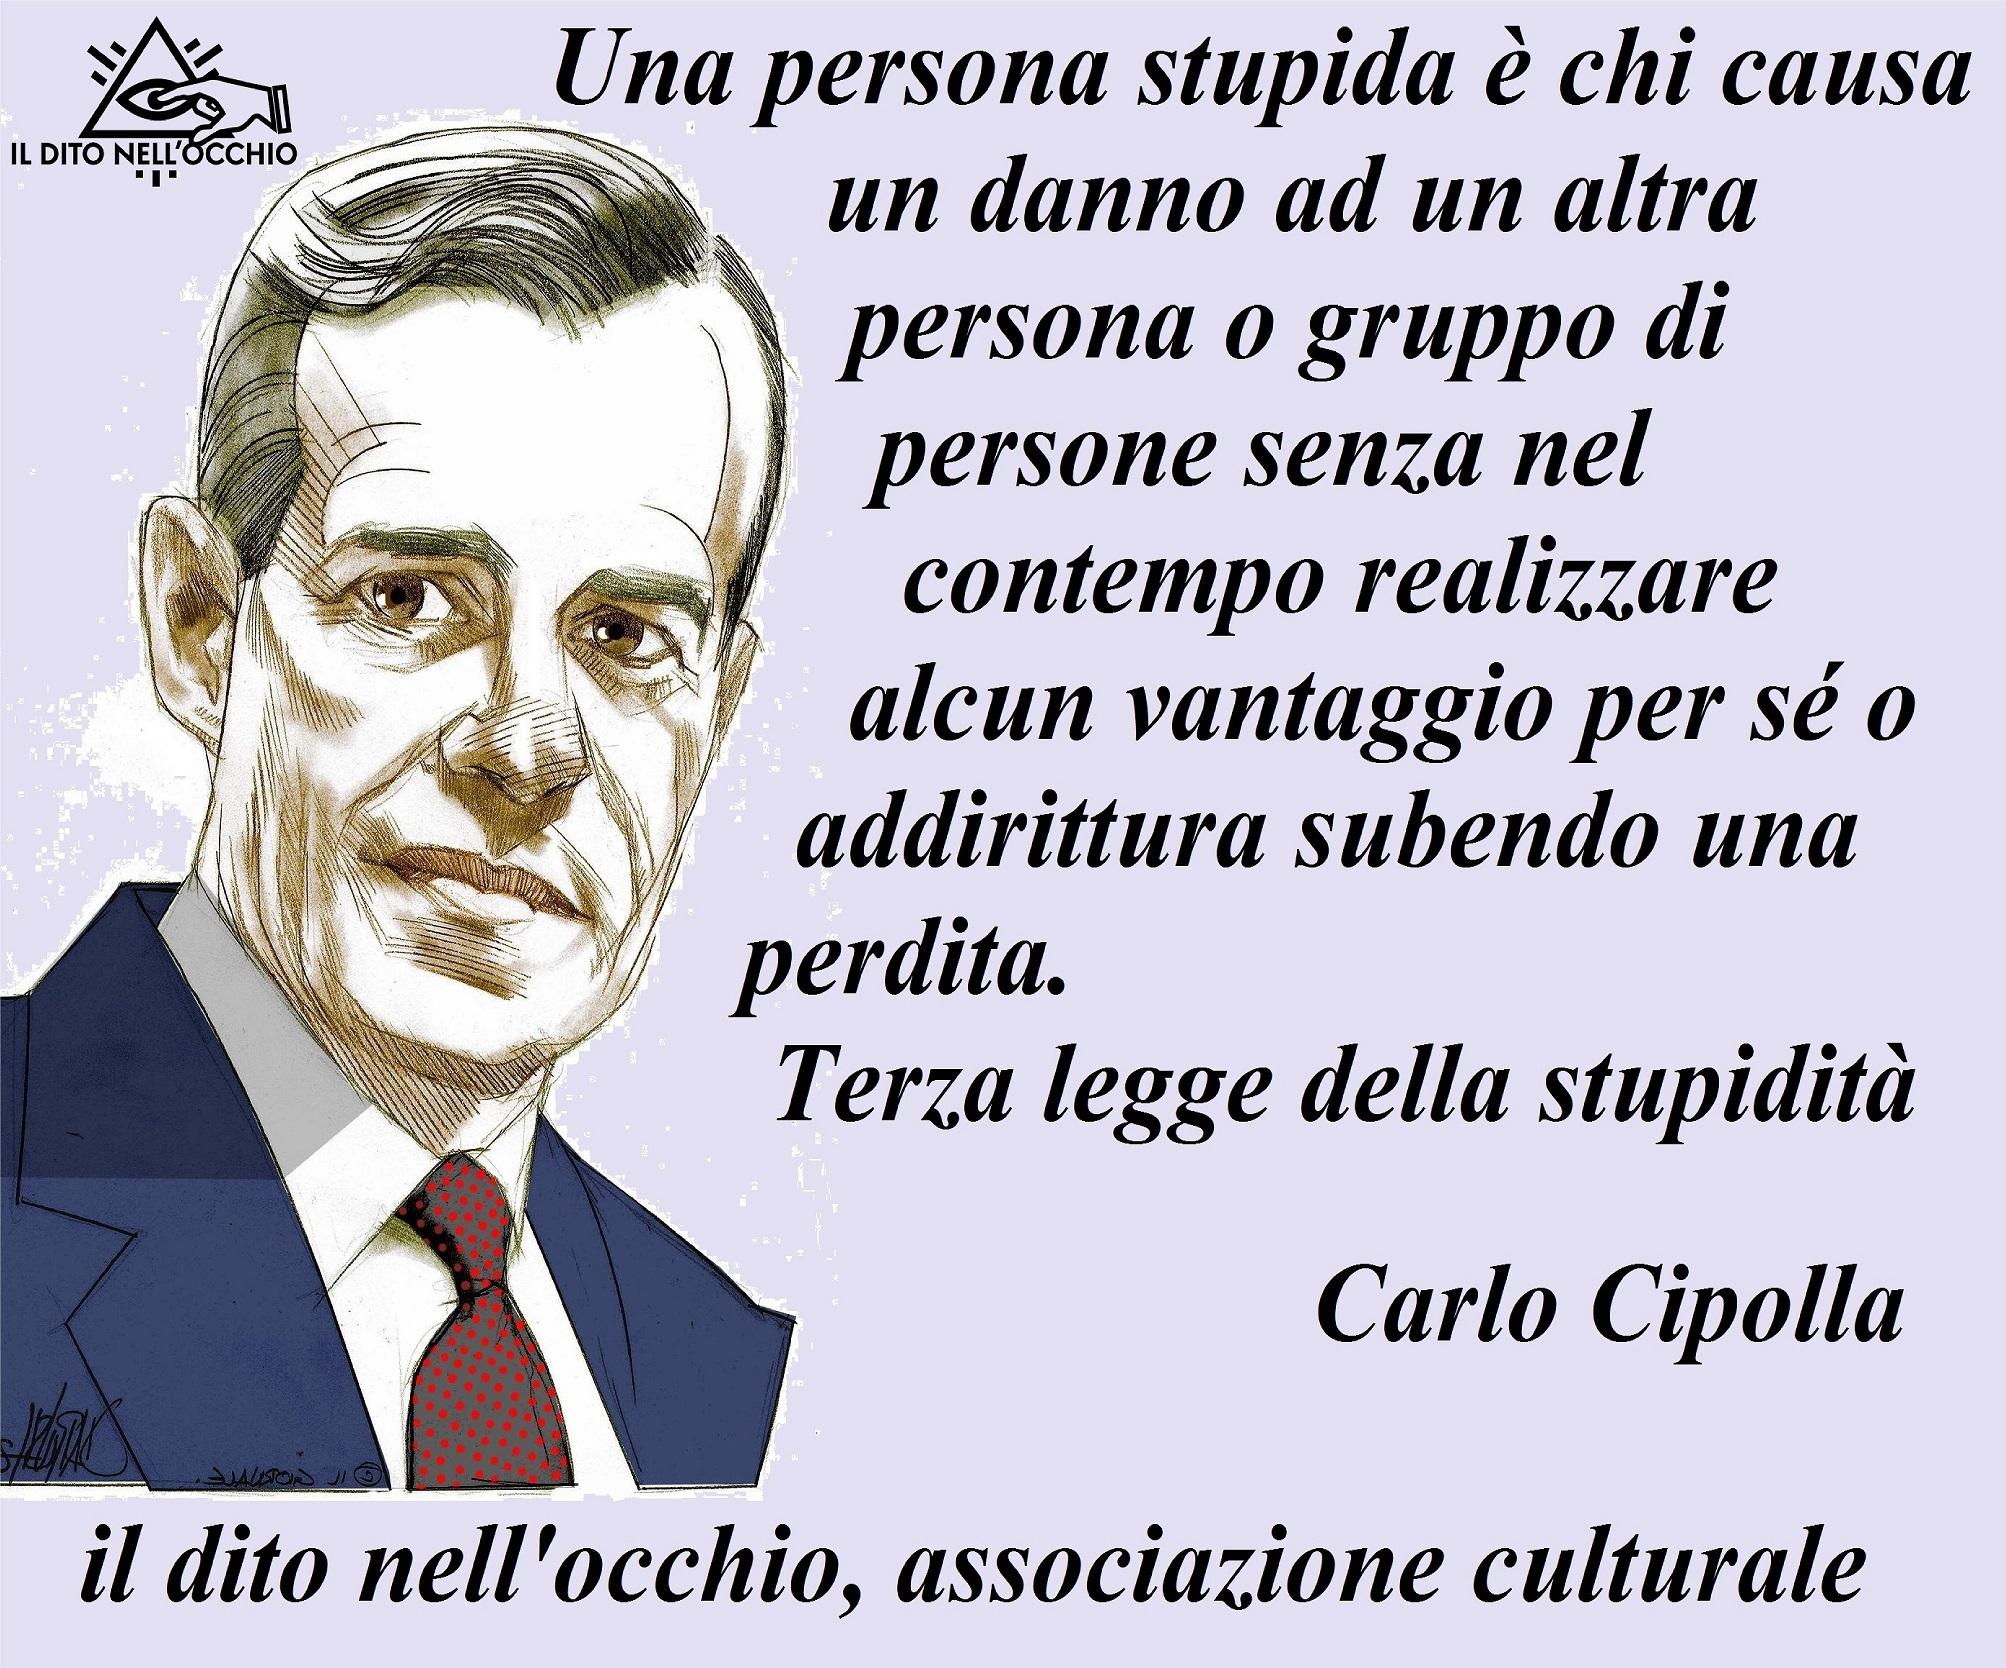 Carlo Cipolla